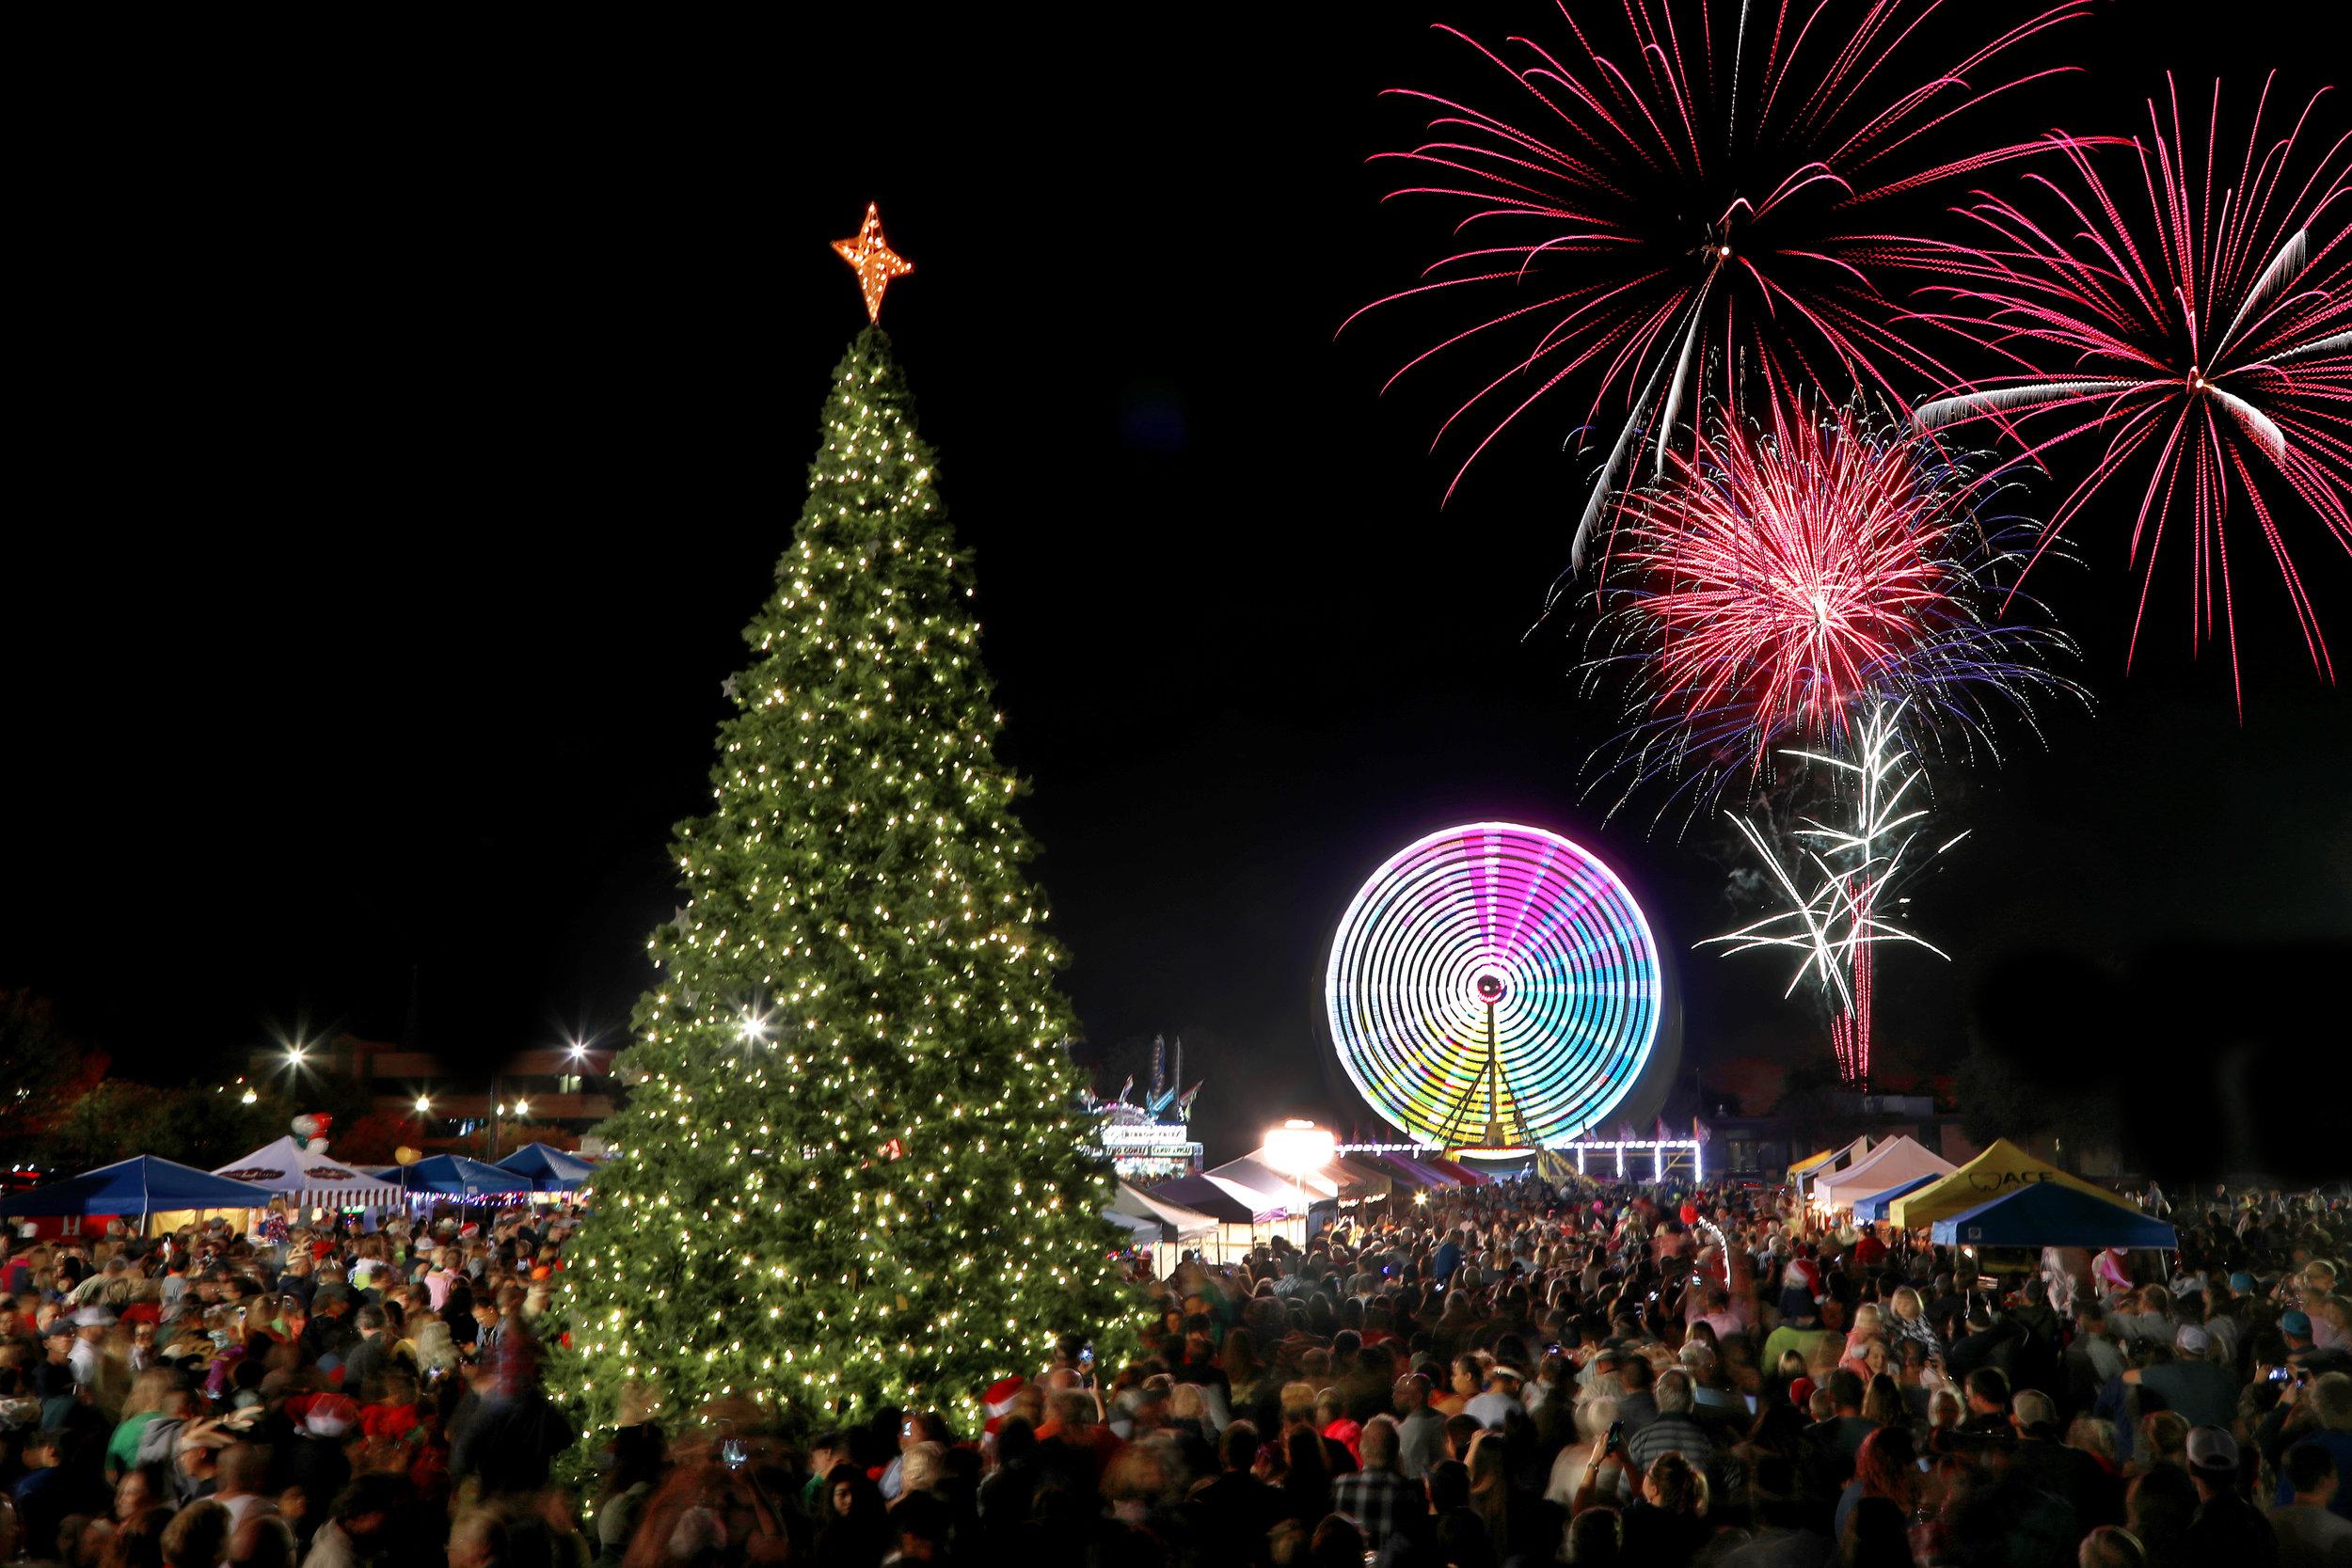 Christmas Lights In Waco Tx 2020 Waco Wonderland